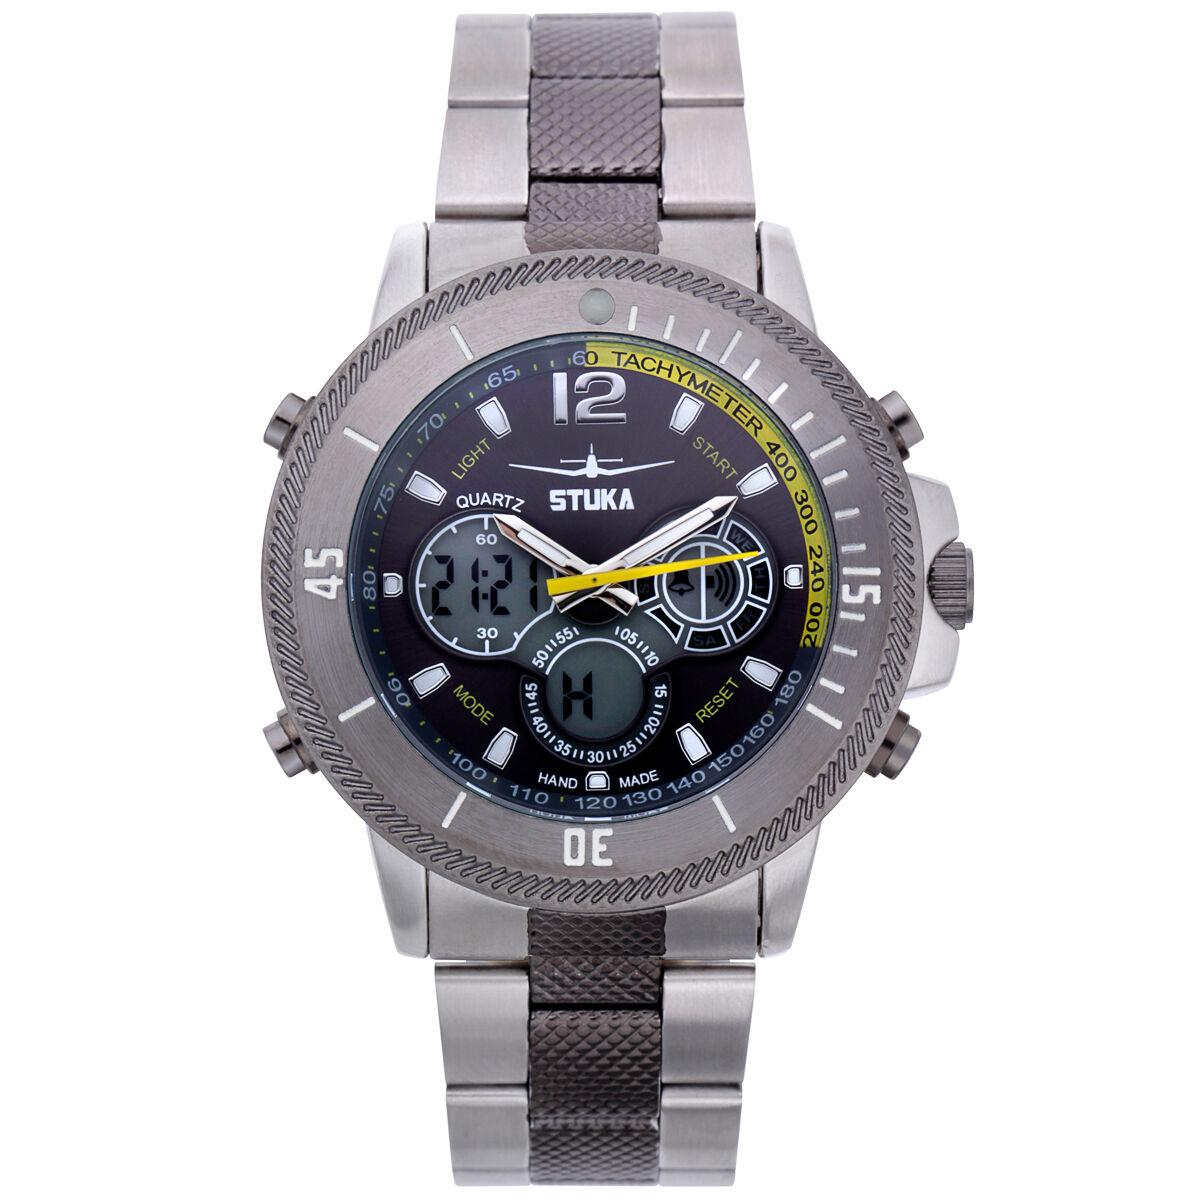 Stuka Ana-Digi Chronograph SR-71 Mens Watch/MSRP $669.00 3 C